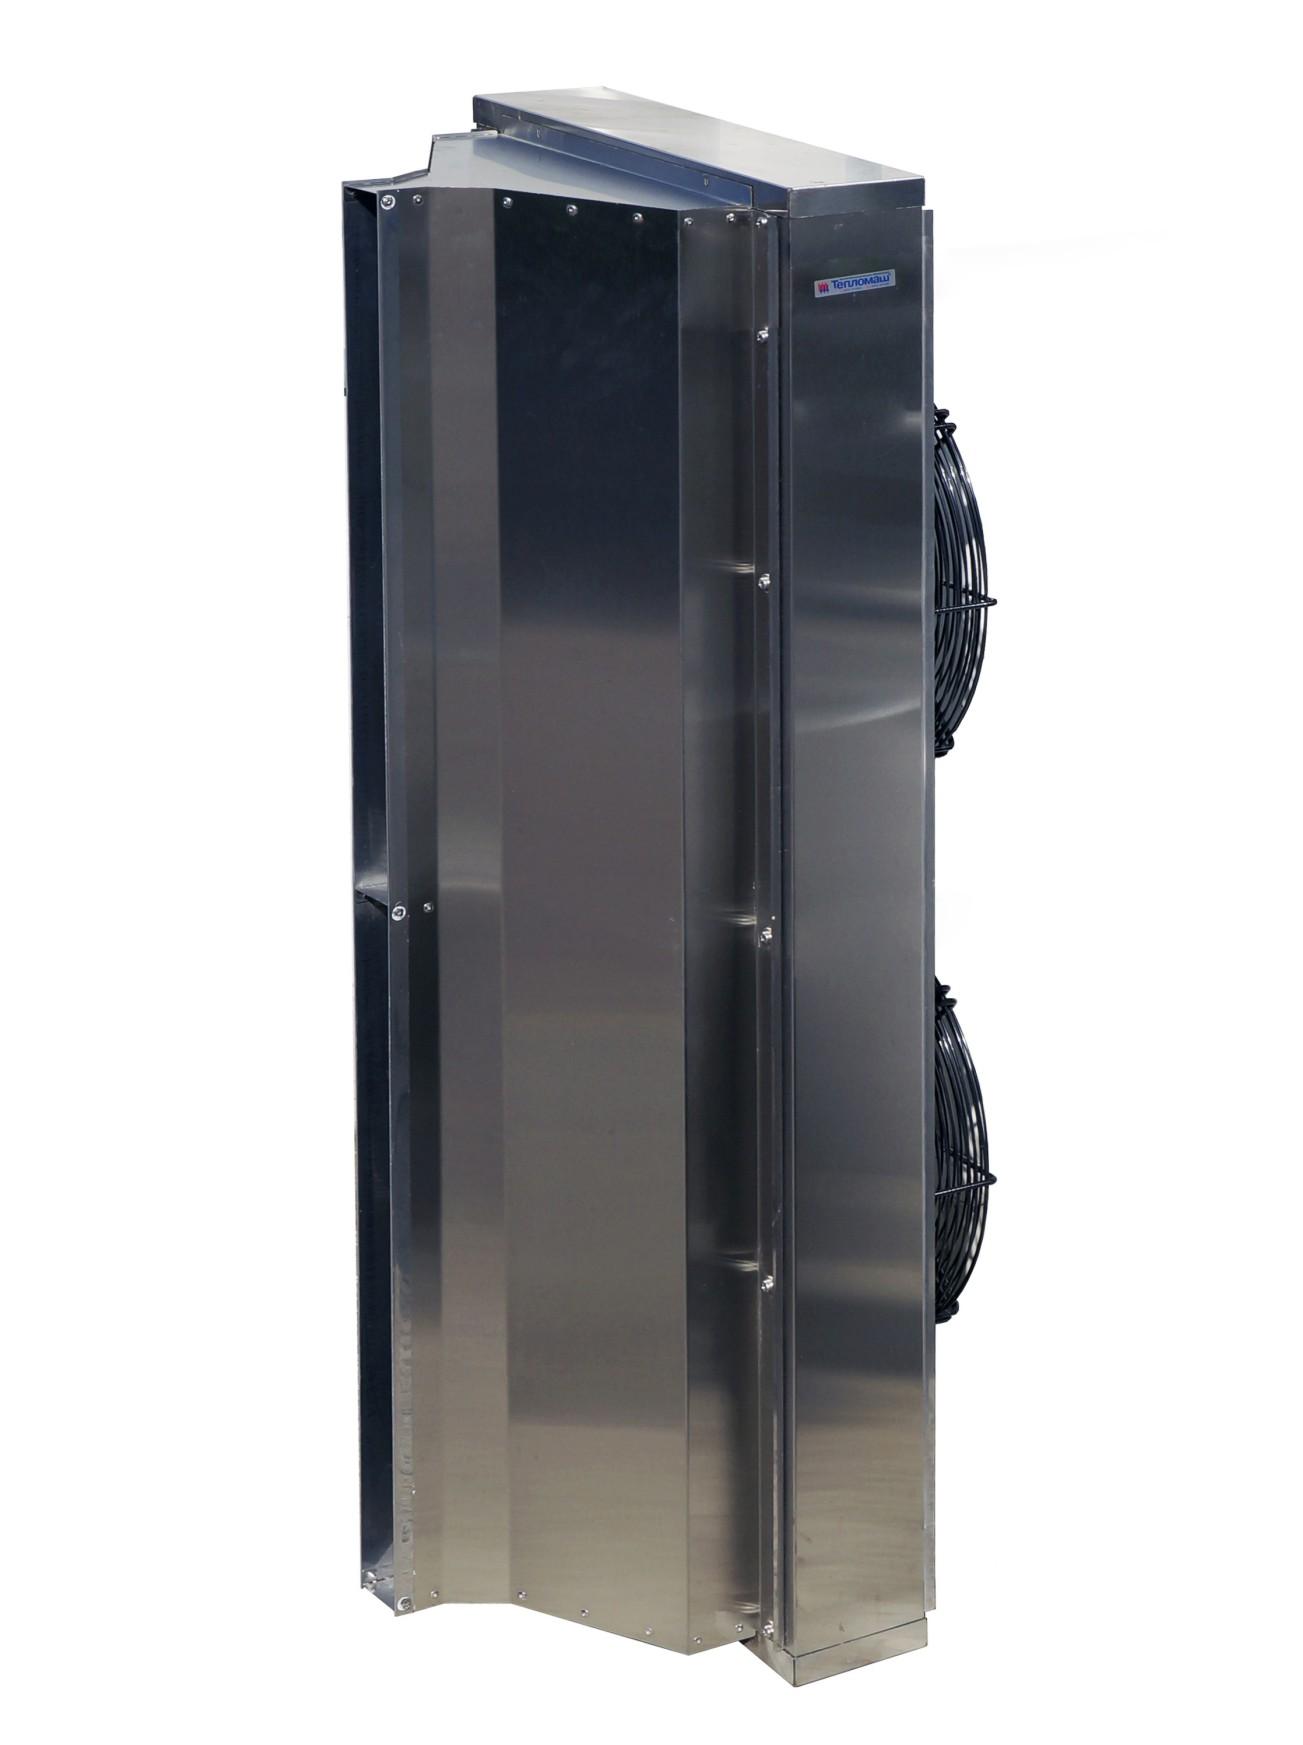 Тепловая завеса Тепломаш КЭВ-100П4060W нерж.